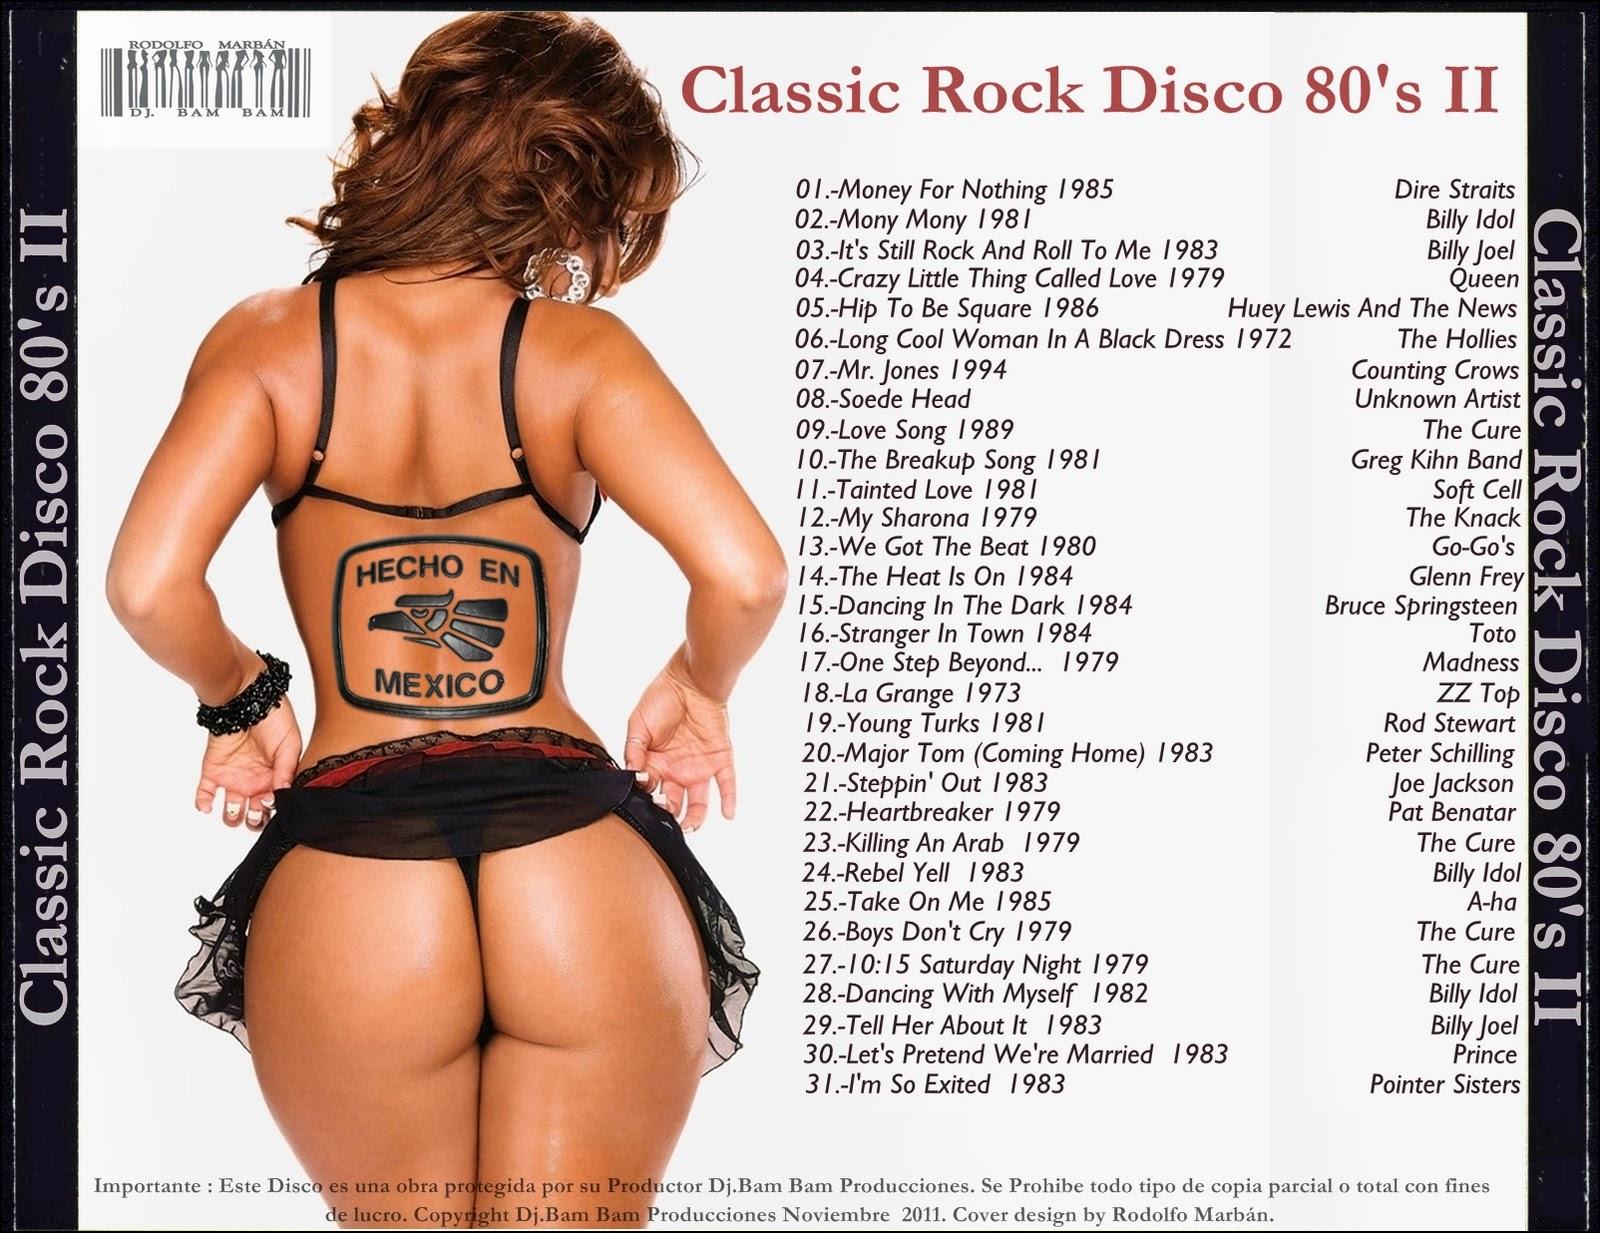 http://3.bp.blogspot.com/-spuYsRXC01Y/TtVwGQAt0vI/AAAAAAAABns/8sfU53GUVU4/s1600/Classic+Rock+Disco+80%2527s+II.jpg